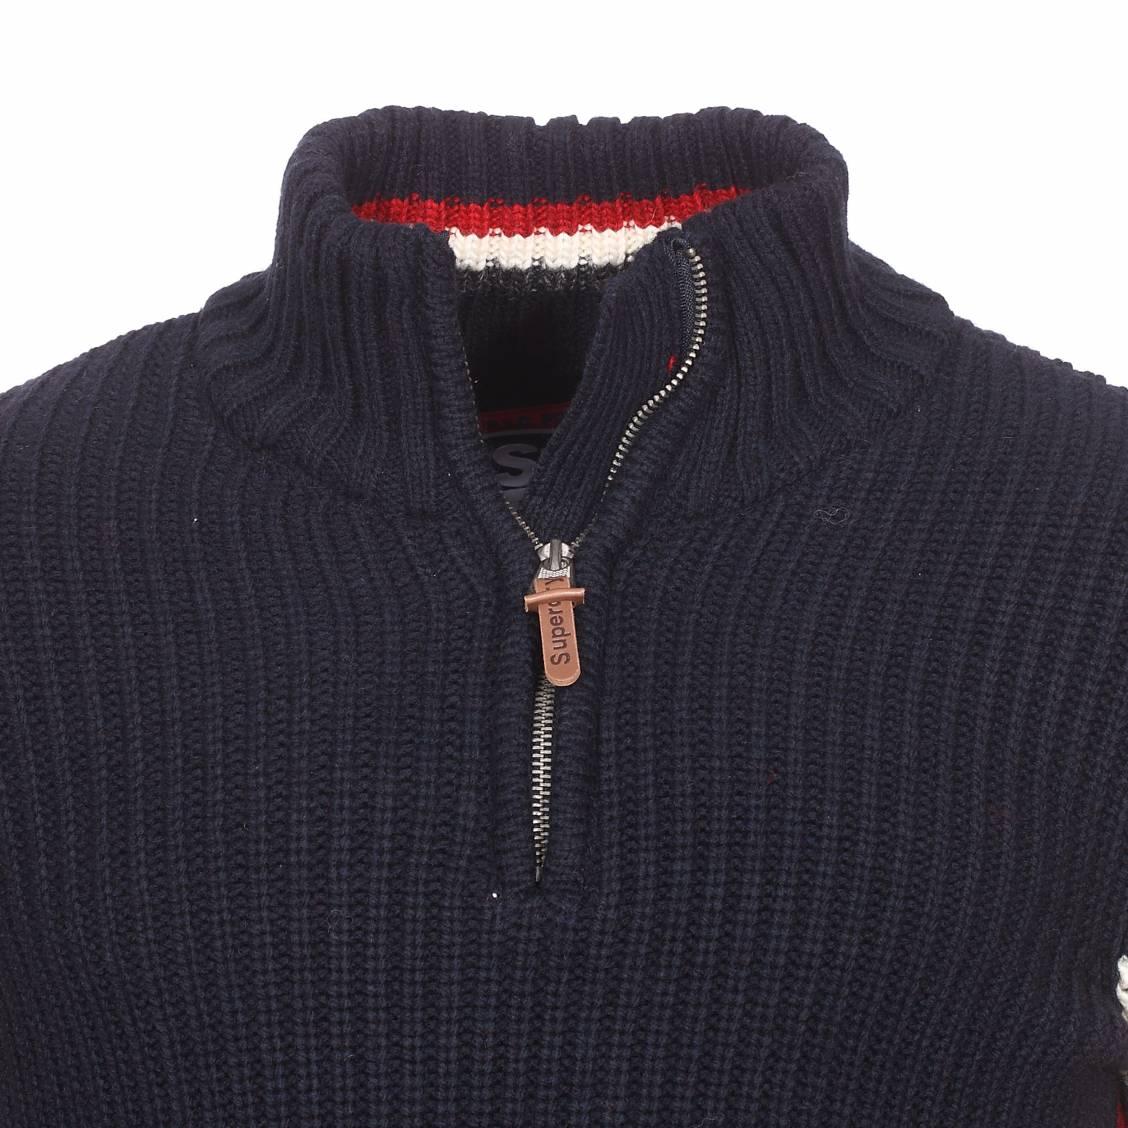 378aa0f2df6c ... Pull col zippé Superdry Ski Dog Henley en laine mélangée bleu marine à  rayures blanches, ...